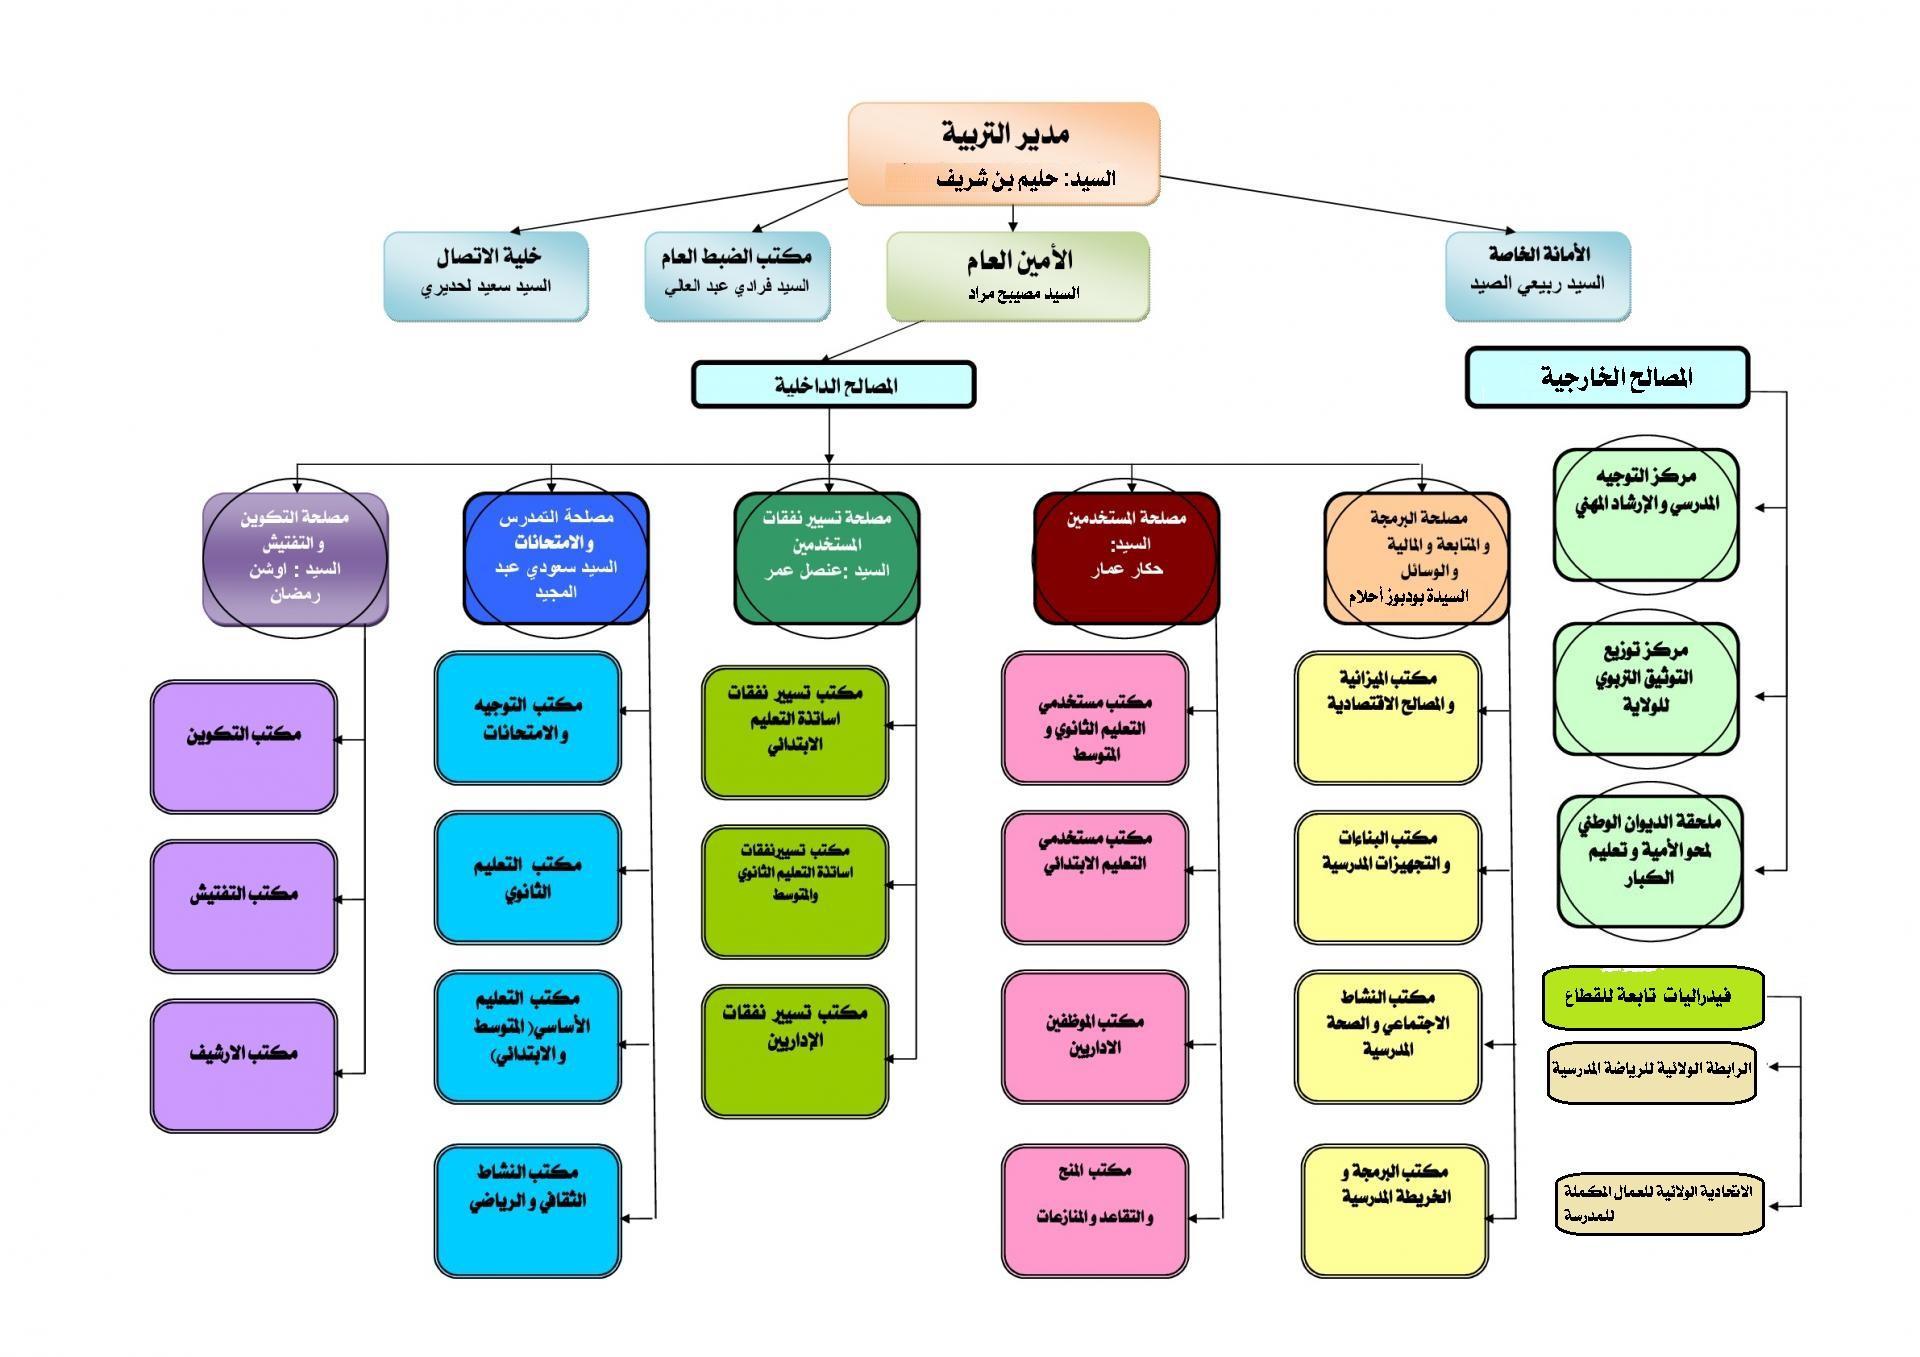 Organigramme de la direction arabe 001 1 1